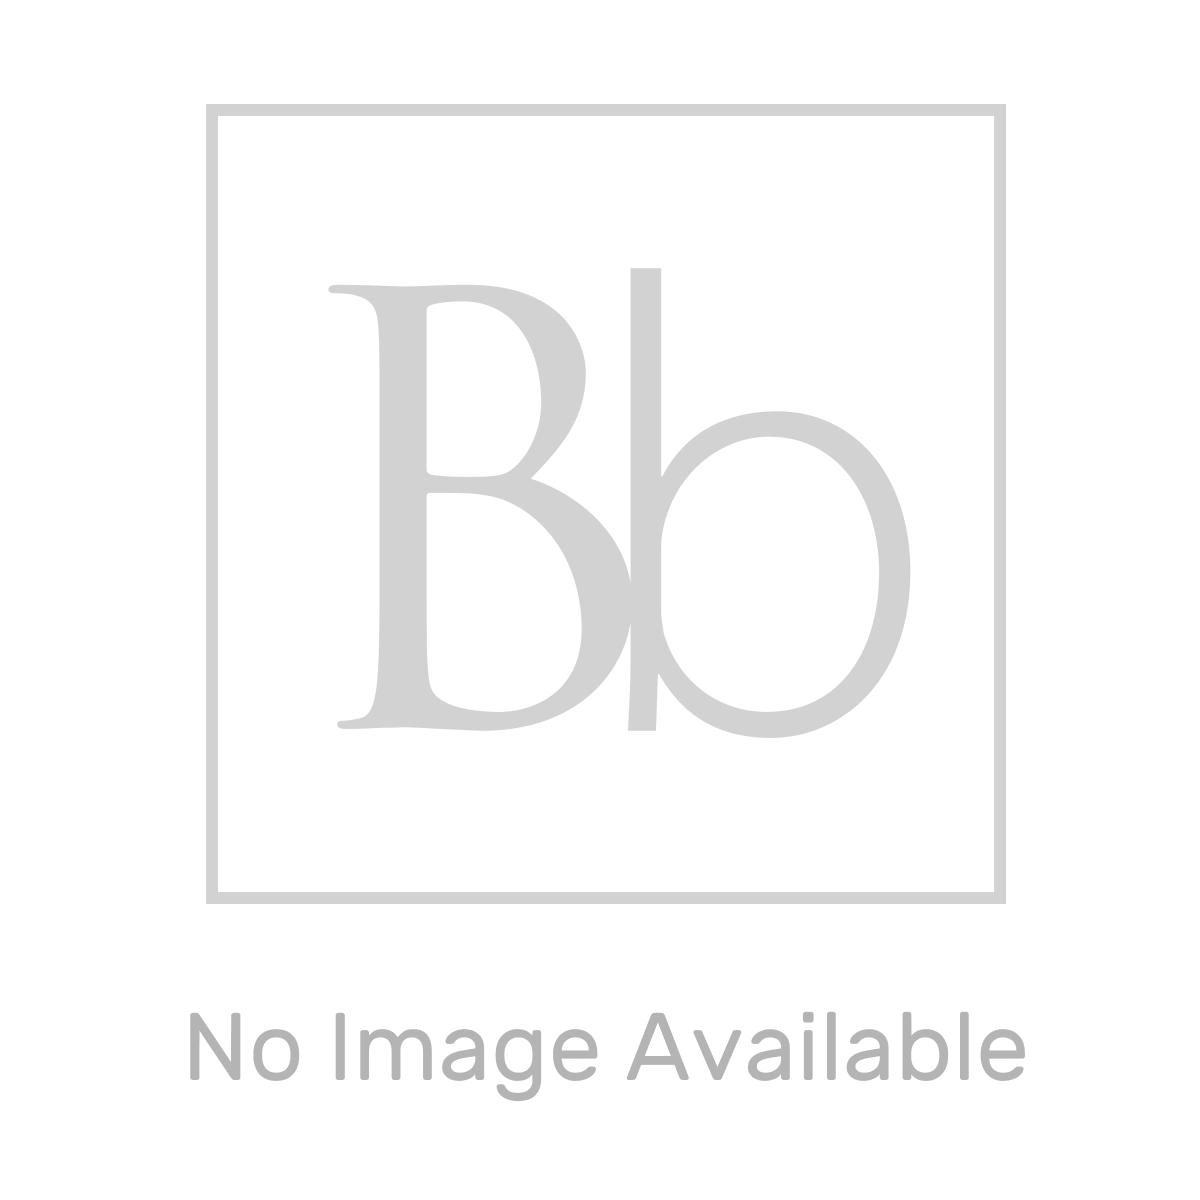 RAK Washington Greige Bathroom Mirror 800mm